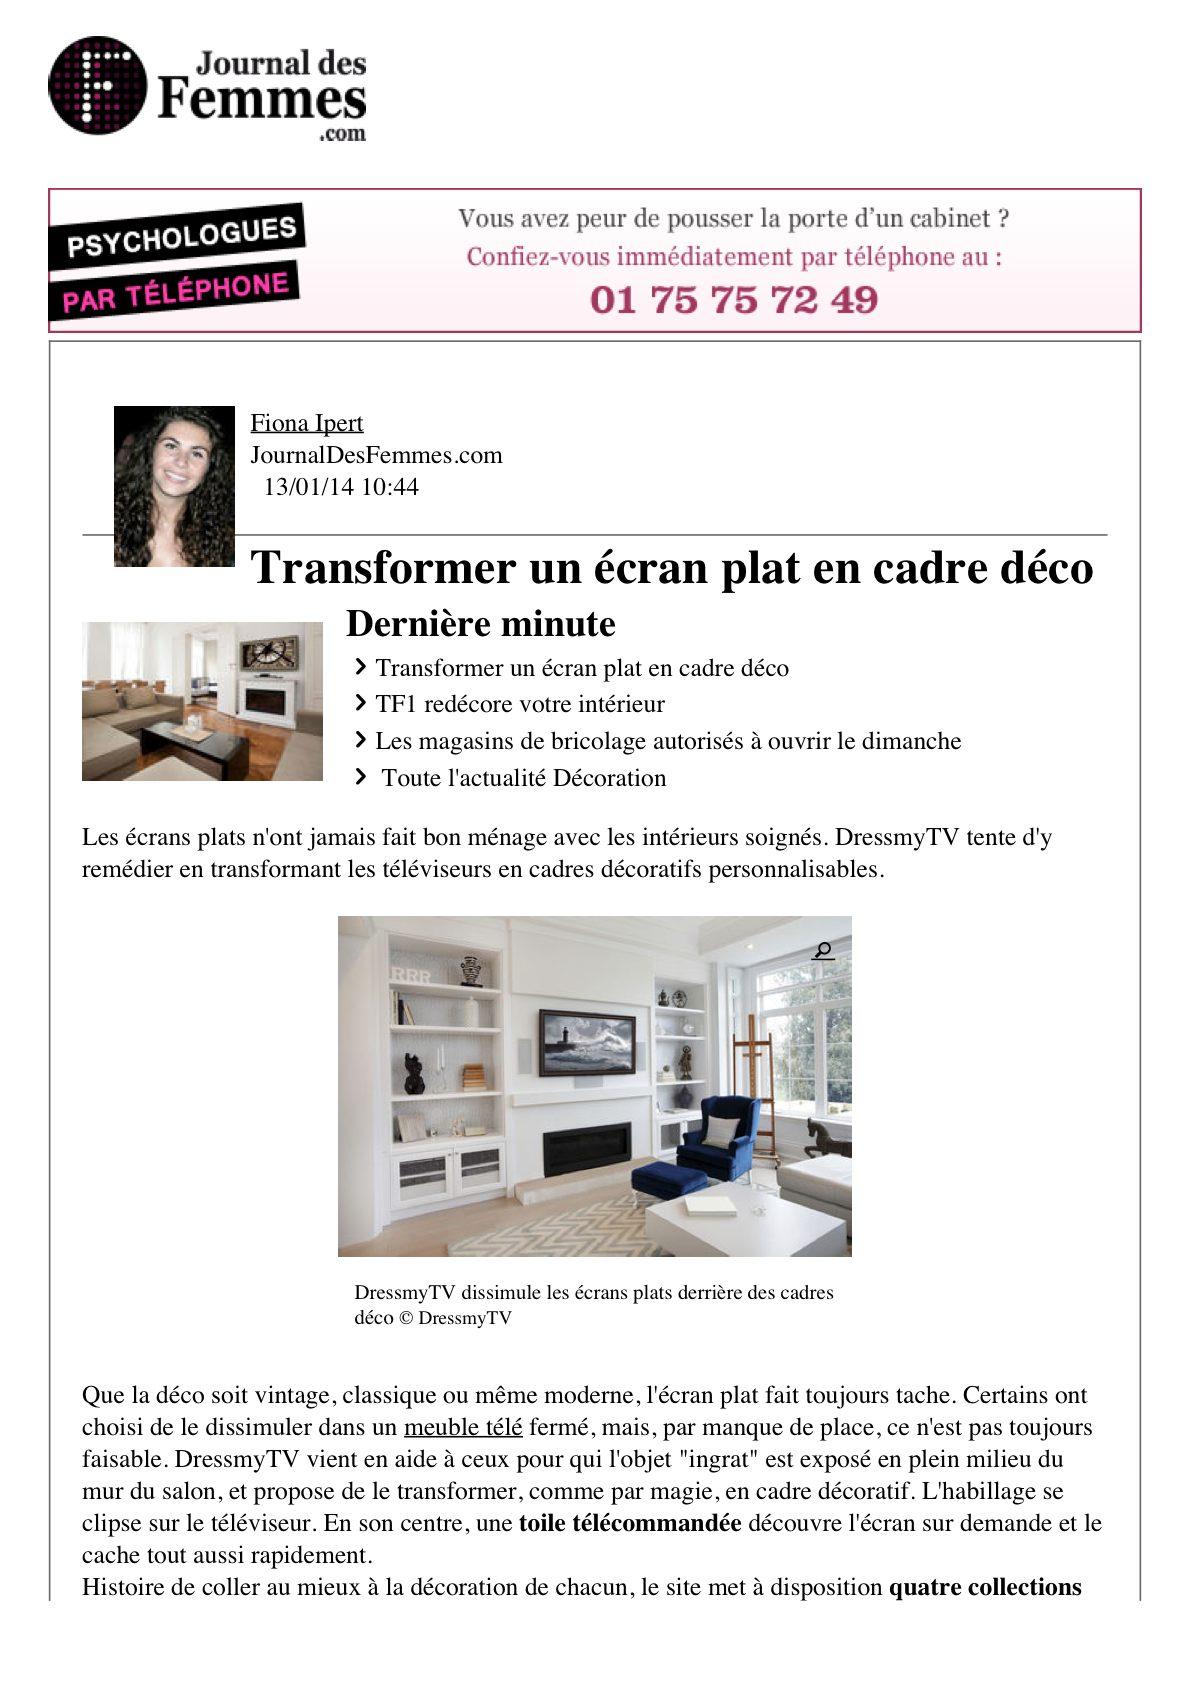 dressmytv-JournaldesFemmesDécoration-janv14